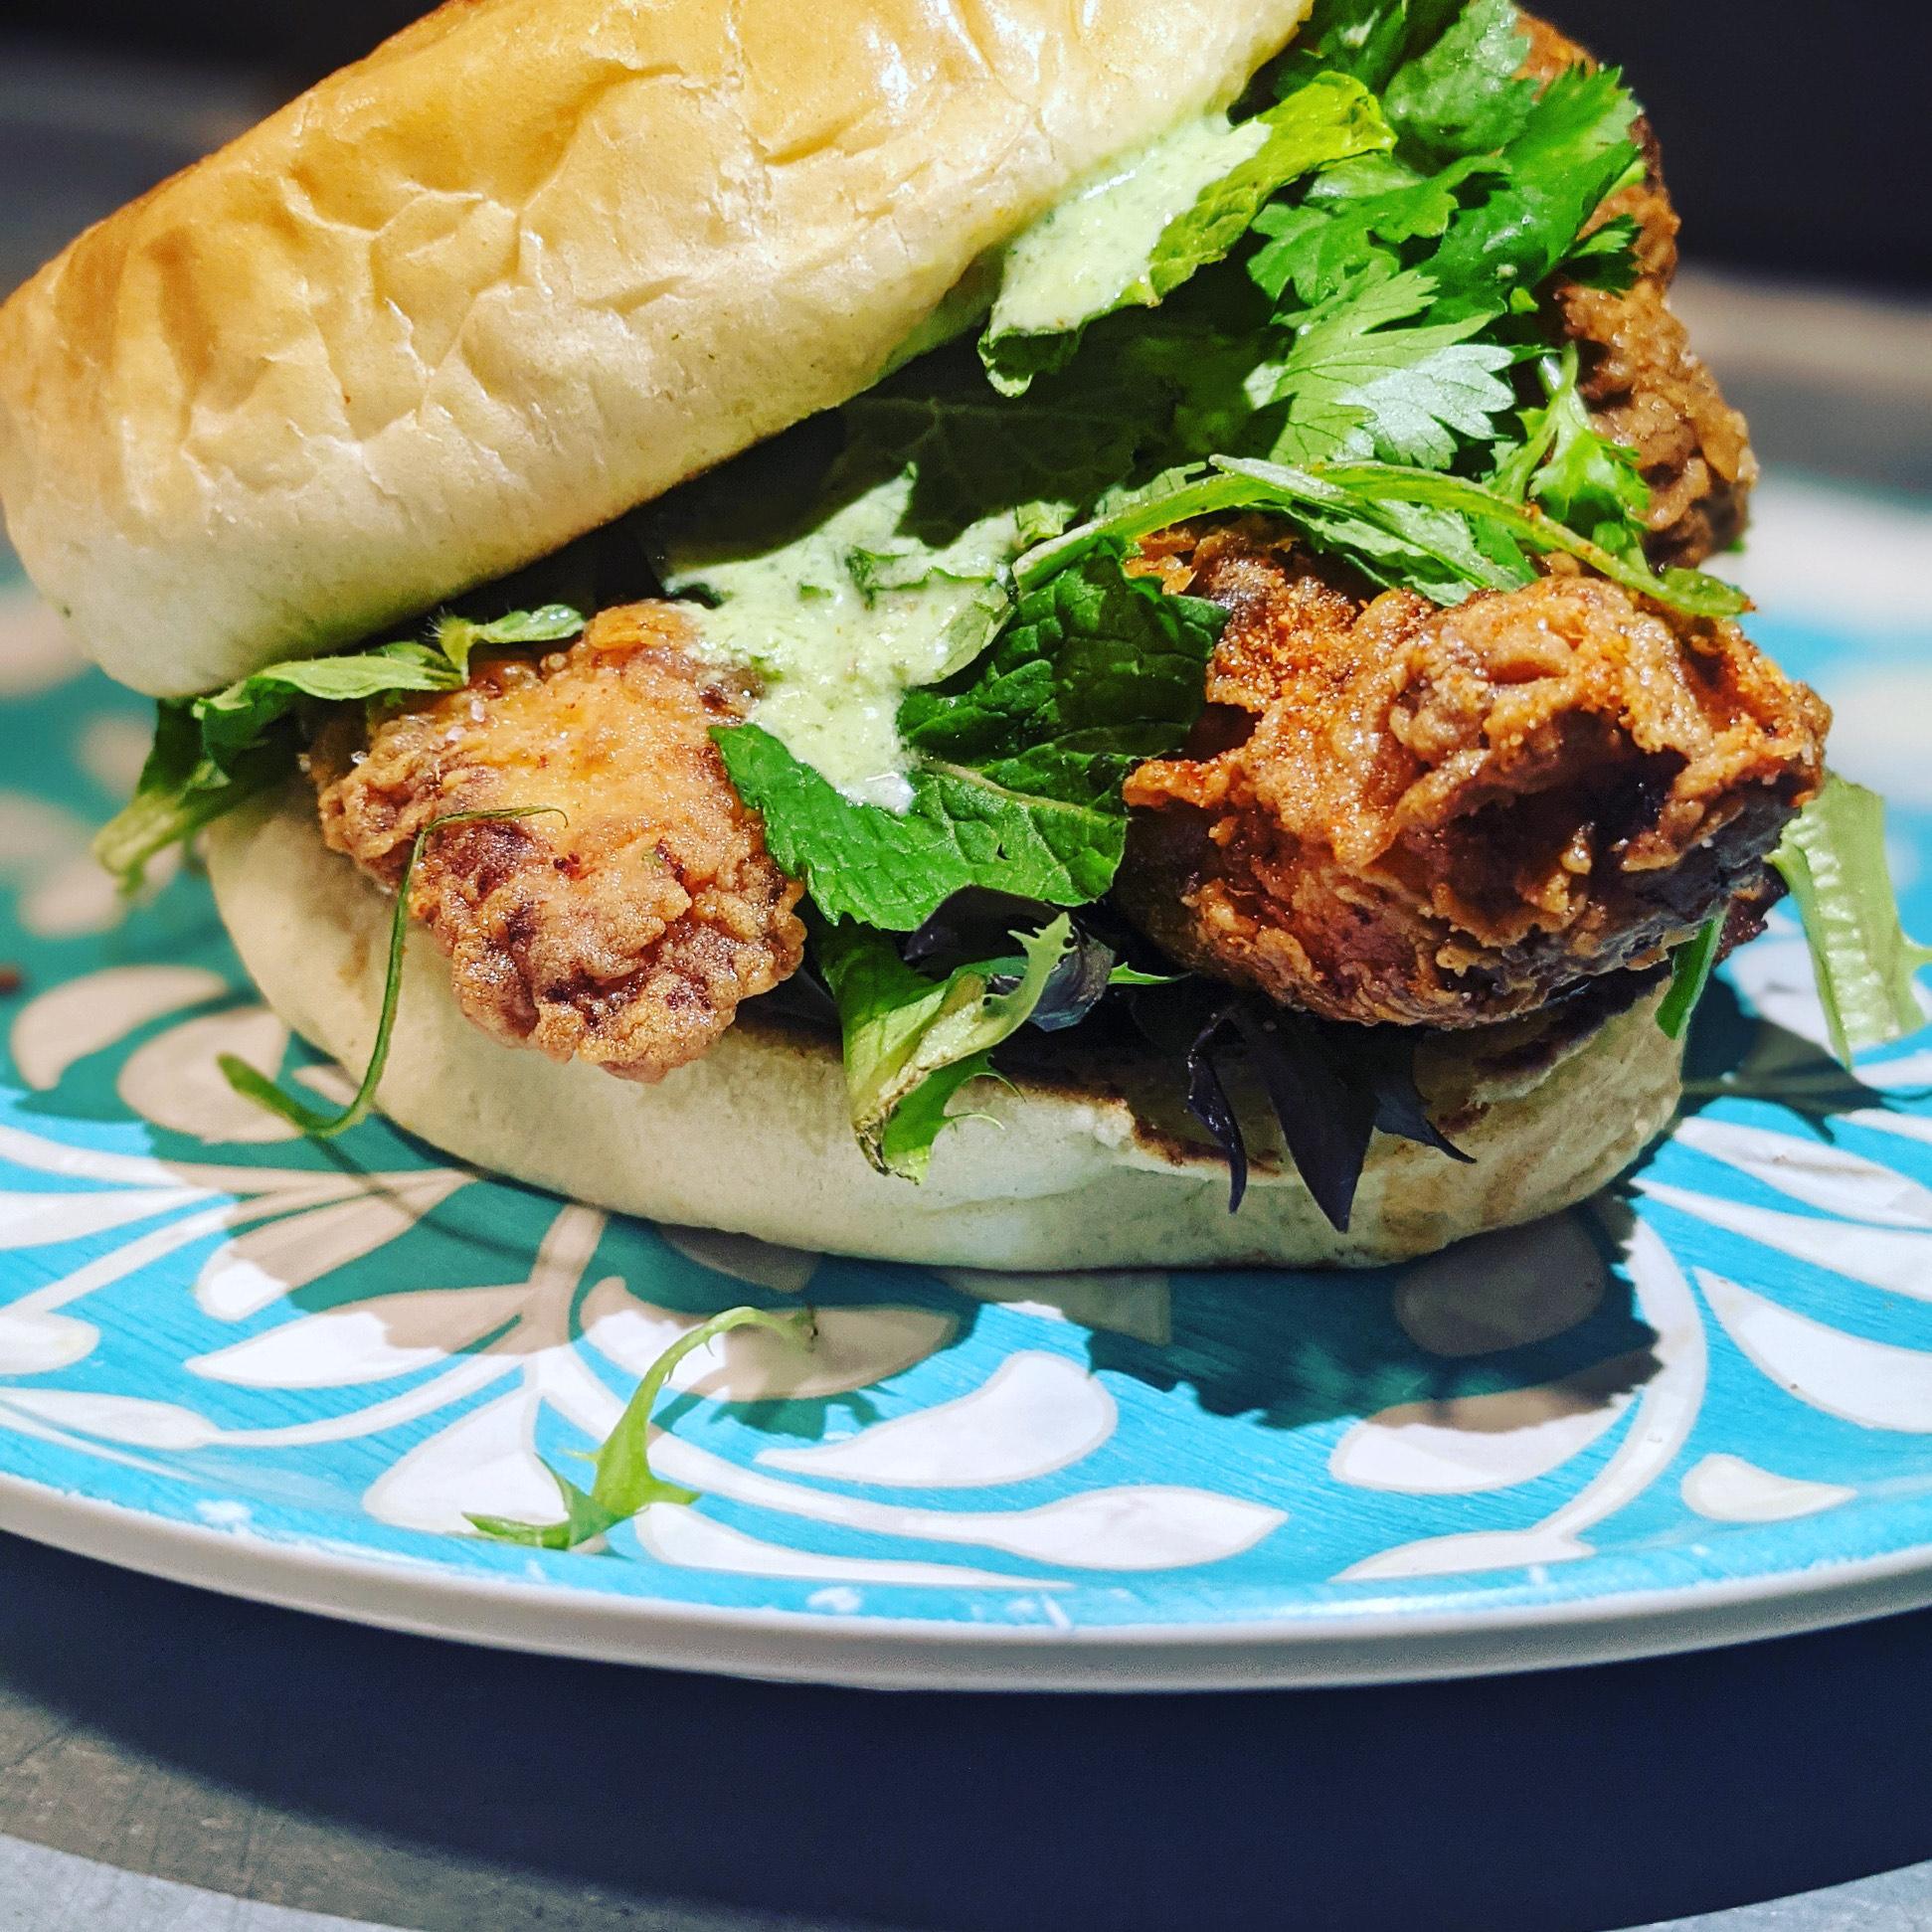 A fried chicken sando on a bun.